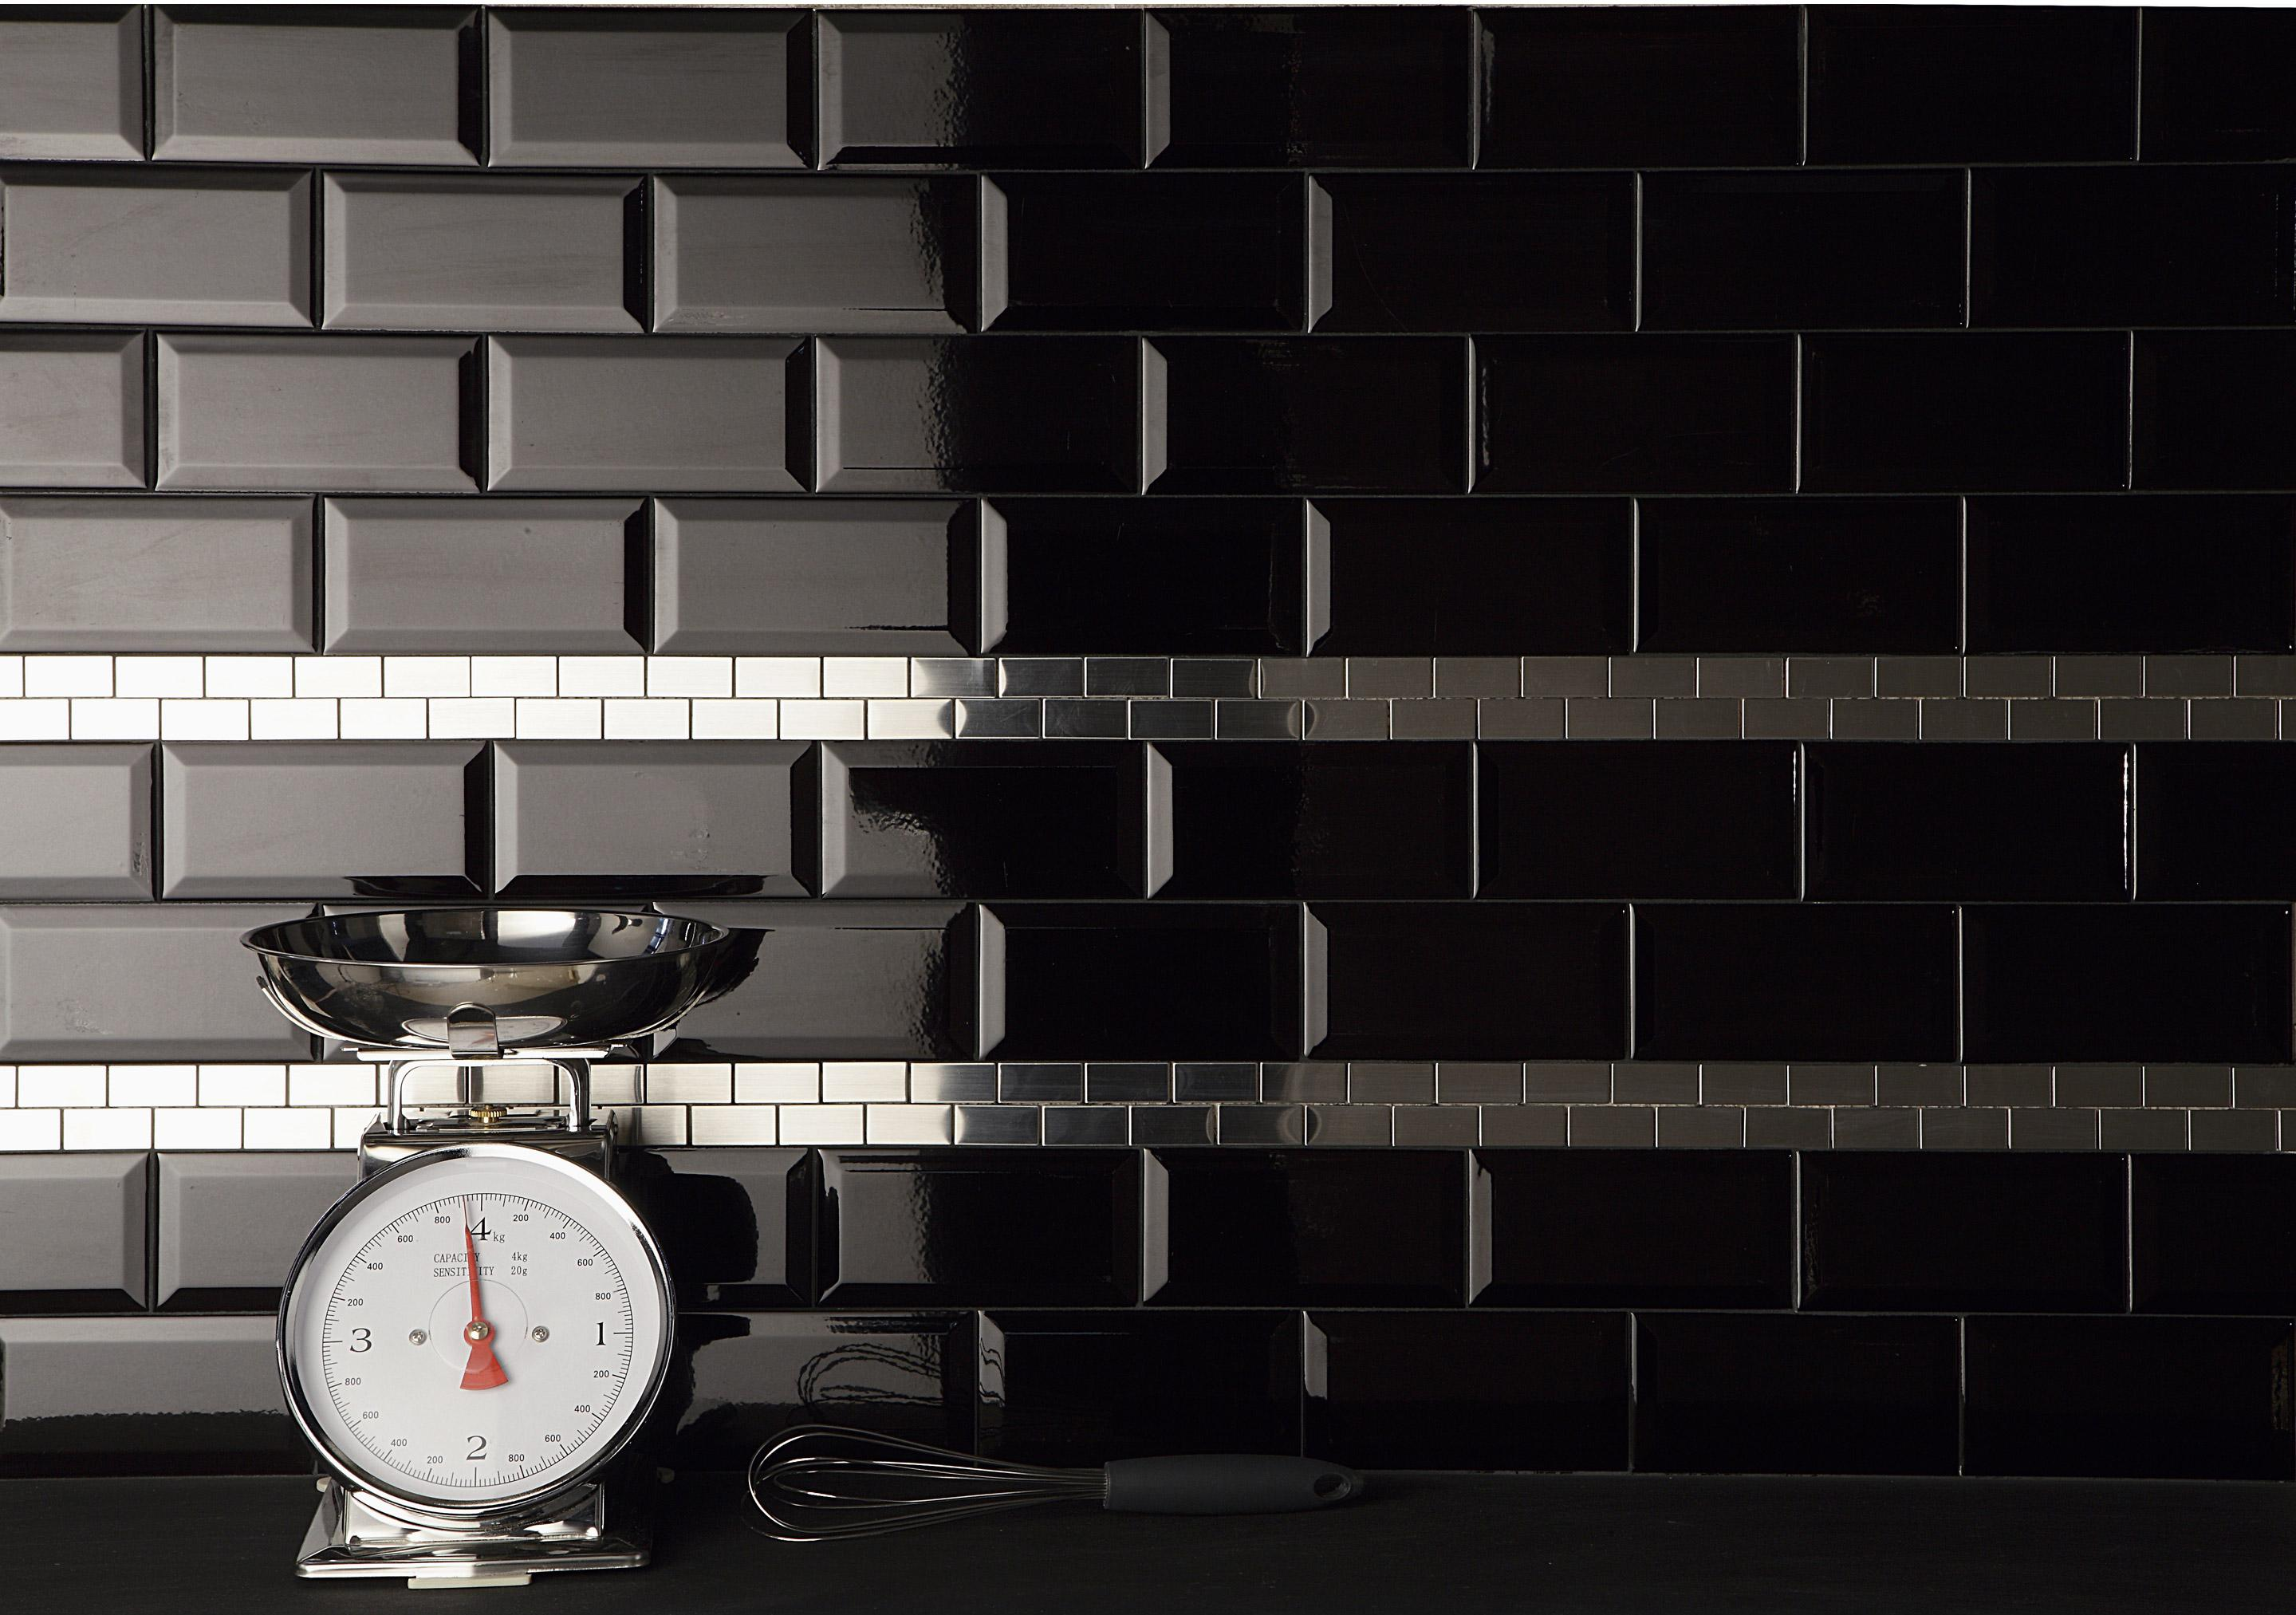 Carrelage mur noir brillante l.15 x L.15 cm, Metro